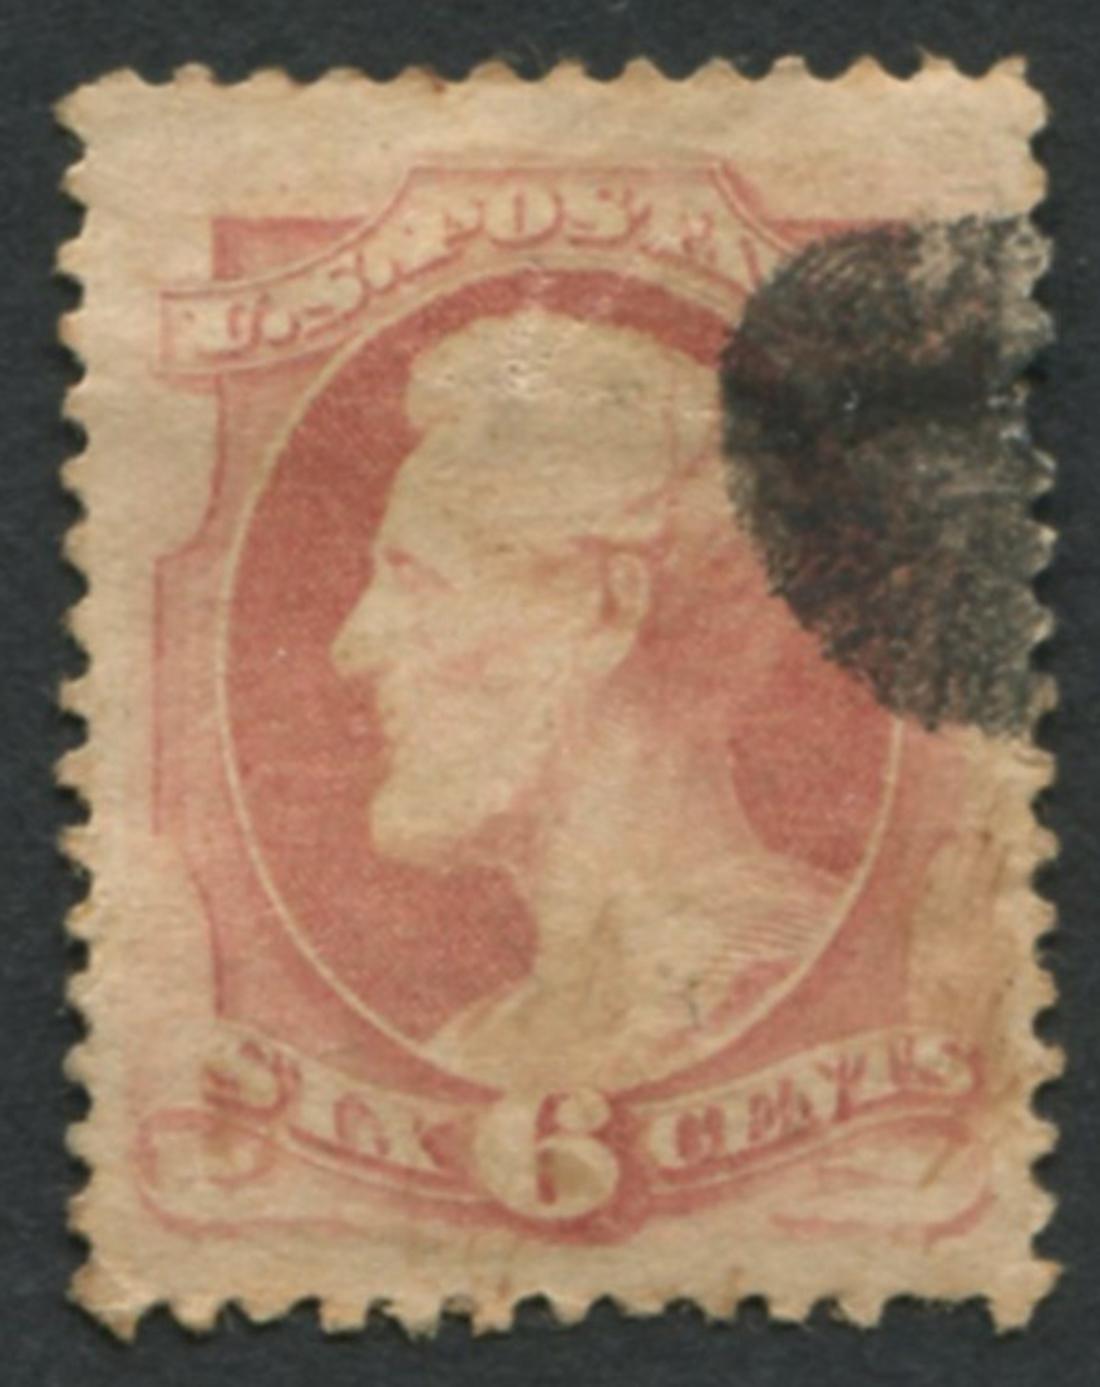 USA 1870 S/C #137 a47 6c Carmine Stamp